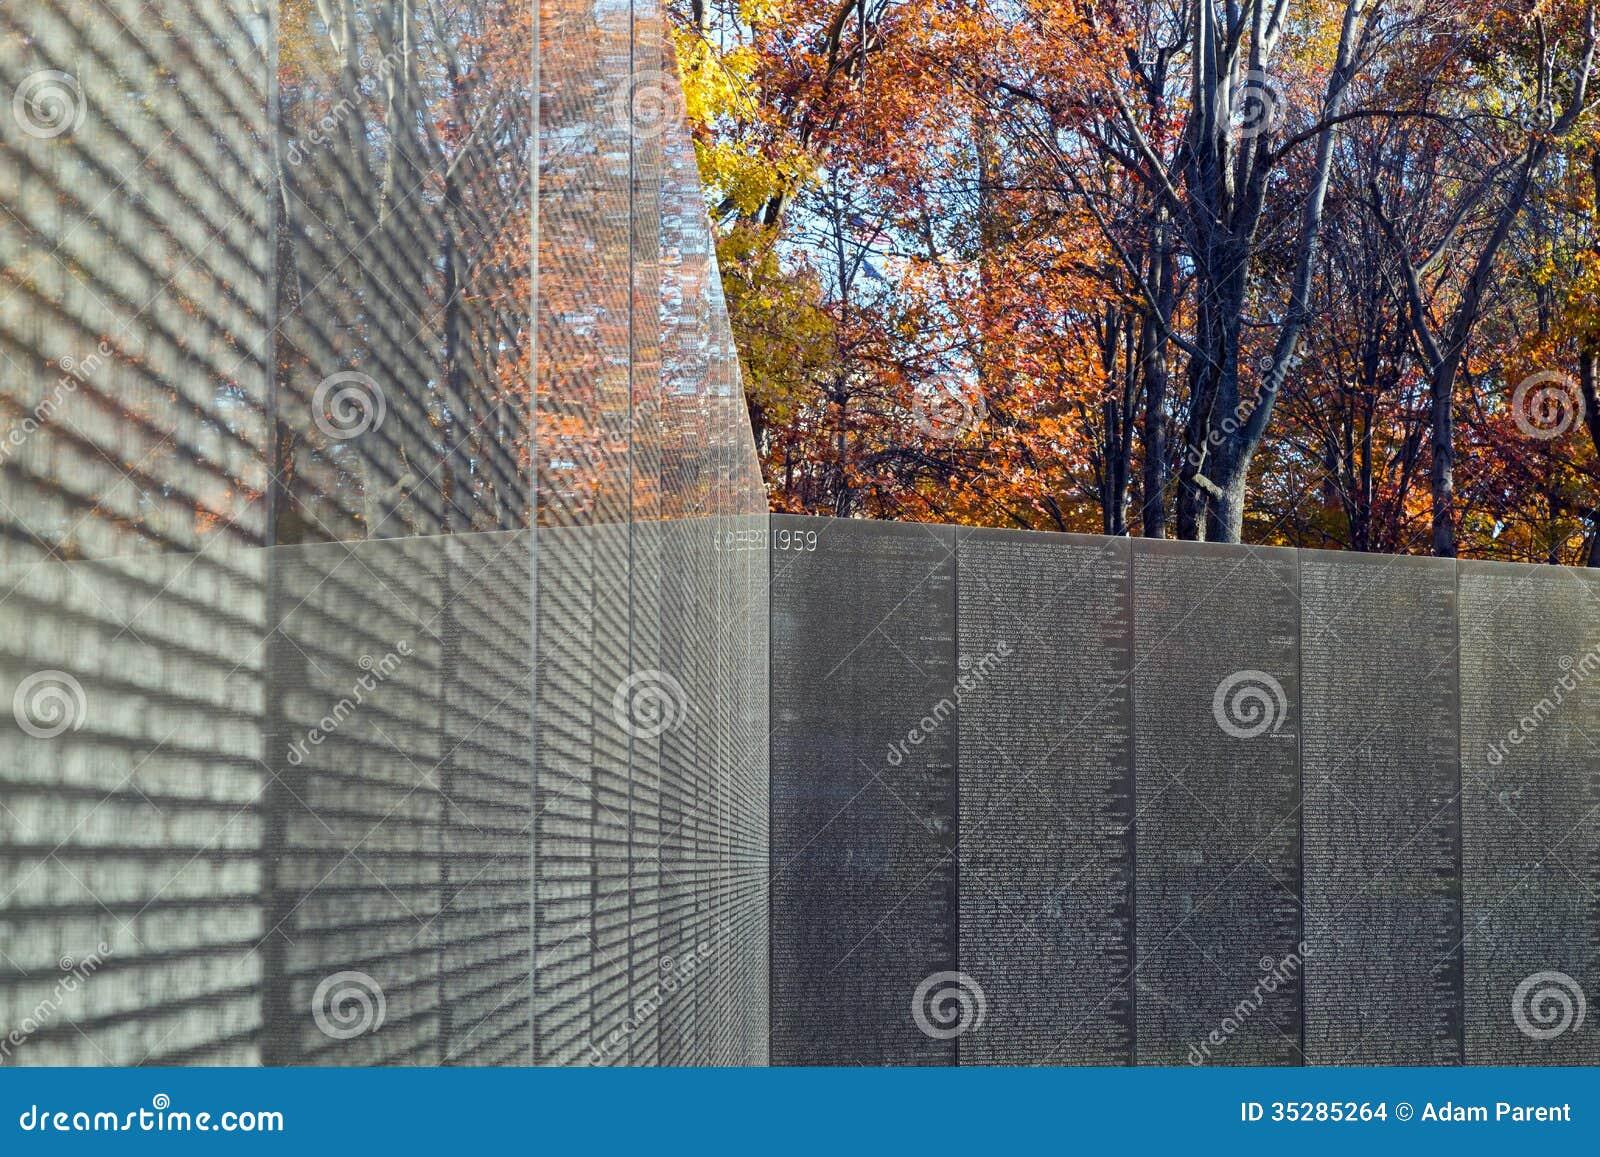 Vietnam Veterans Memorial Wall Editorial Stock Image